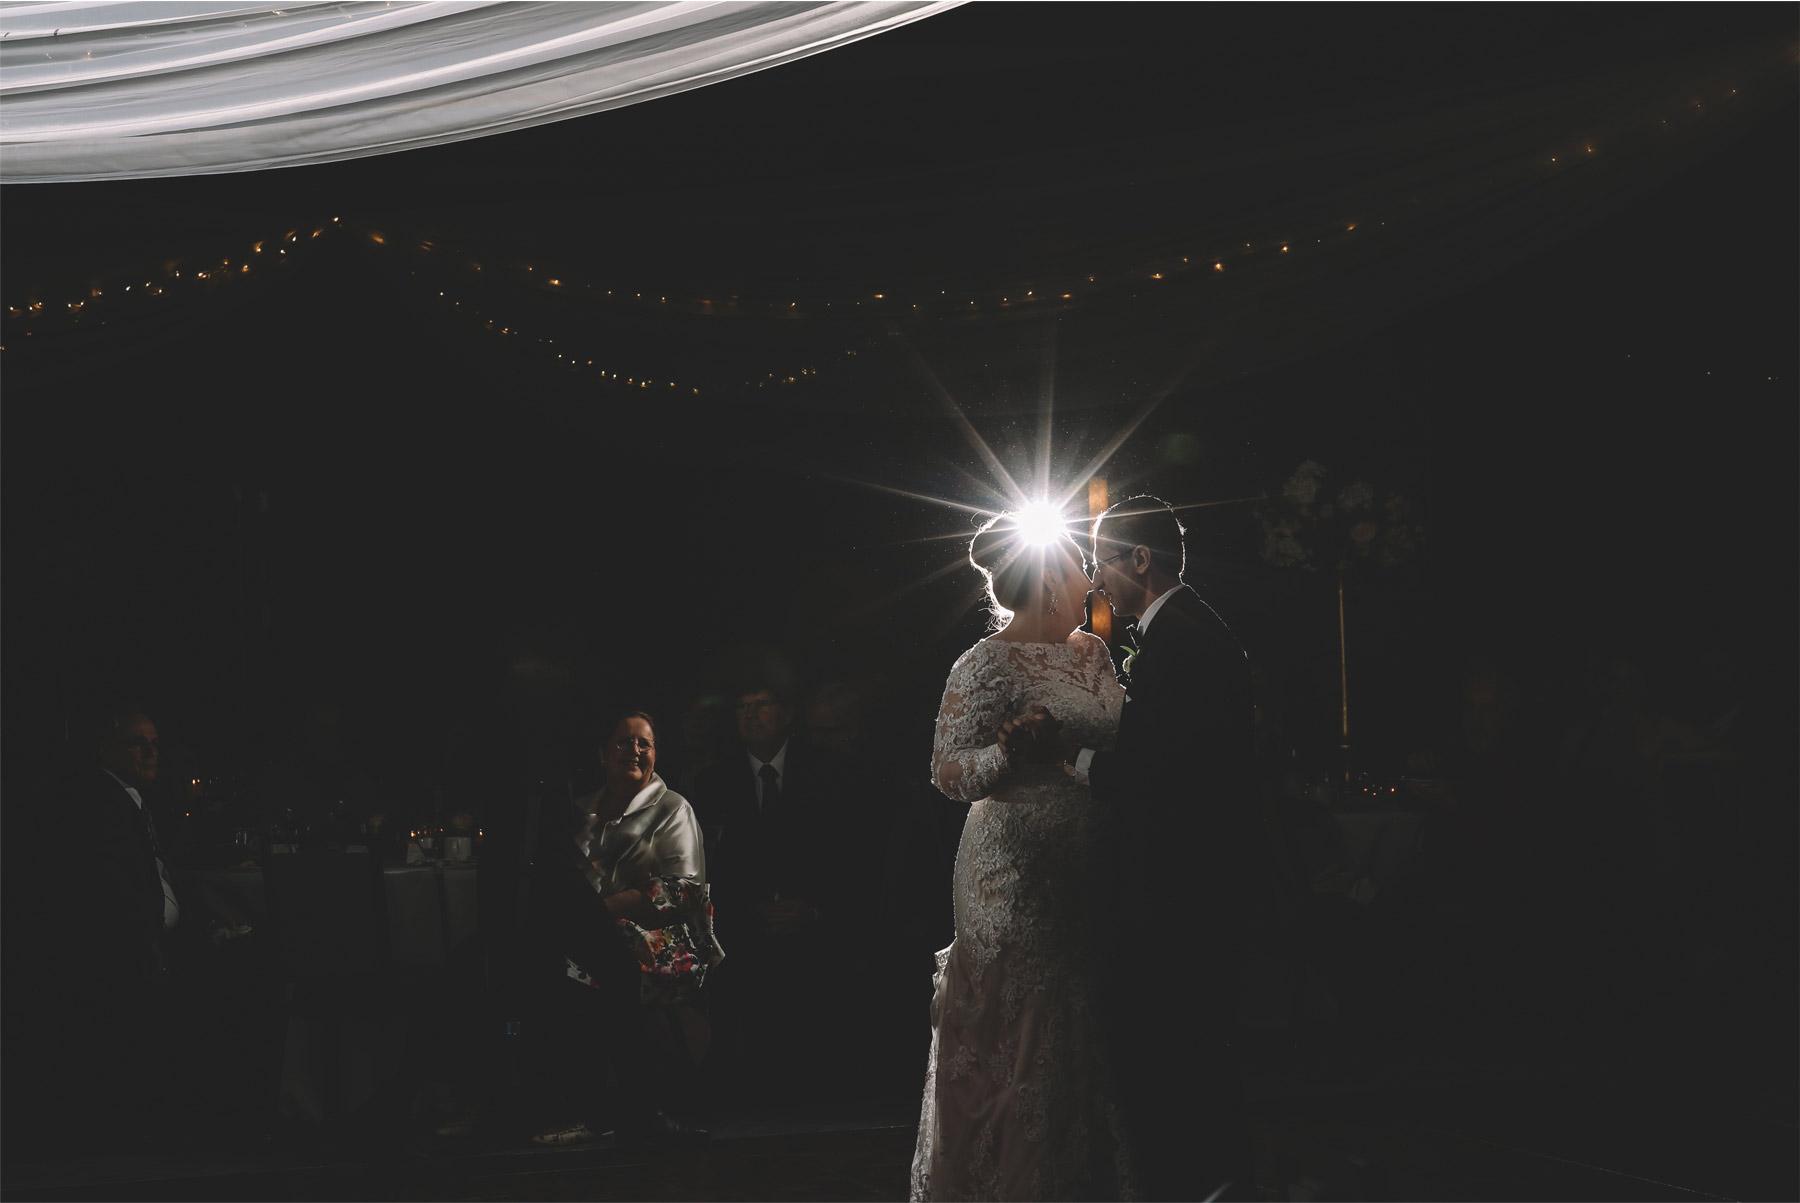 20-Minneapolis-Minnesota-Wedding-Photography-by-Vick-Photography-Downtown-Windows-on-Minnesota-Reception-First-Dance-Anja-and-Waseem.jpg